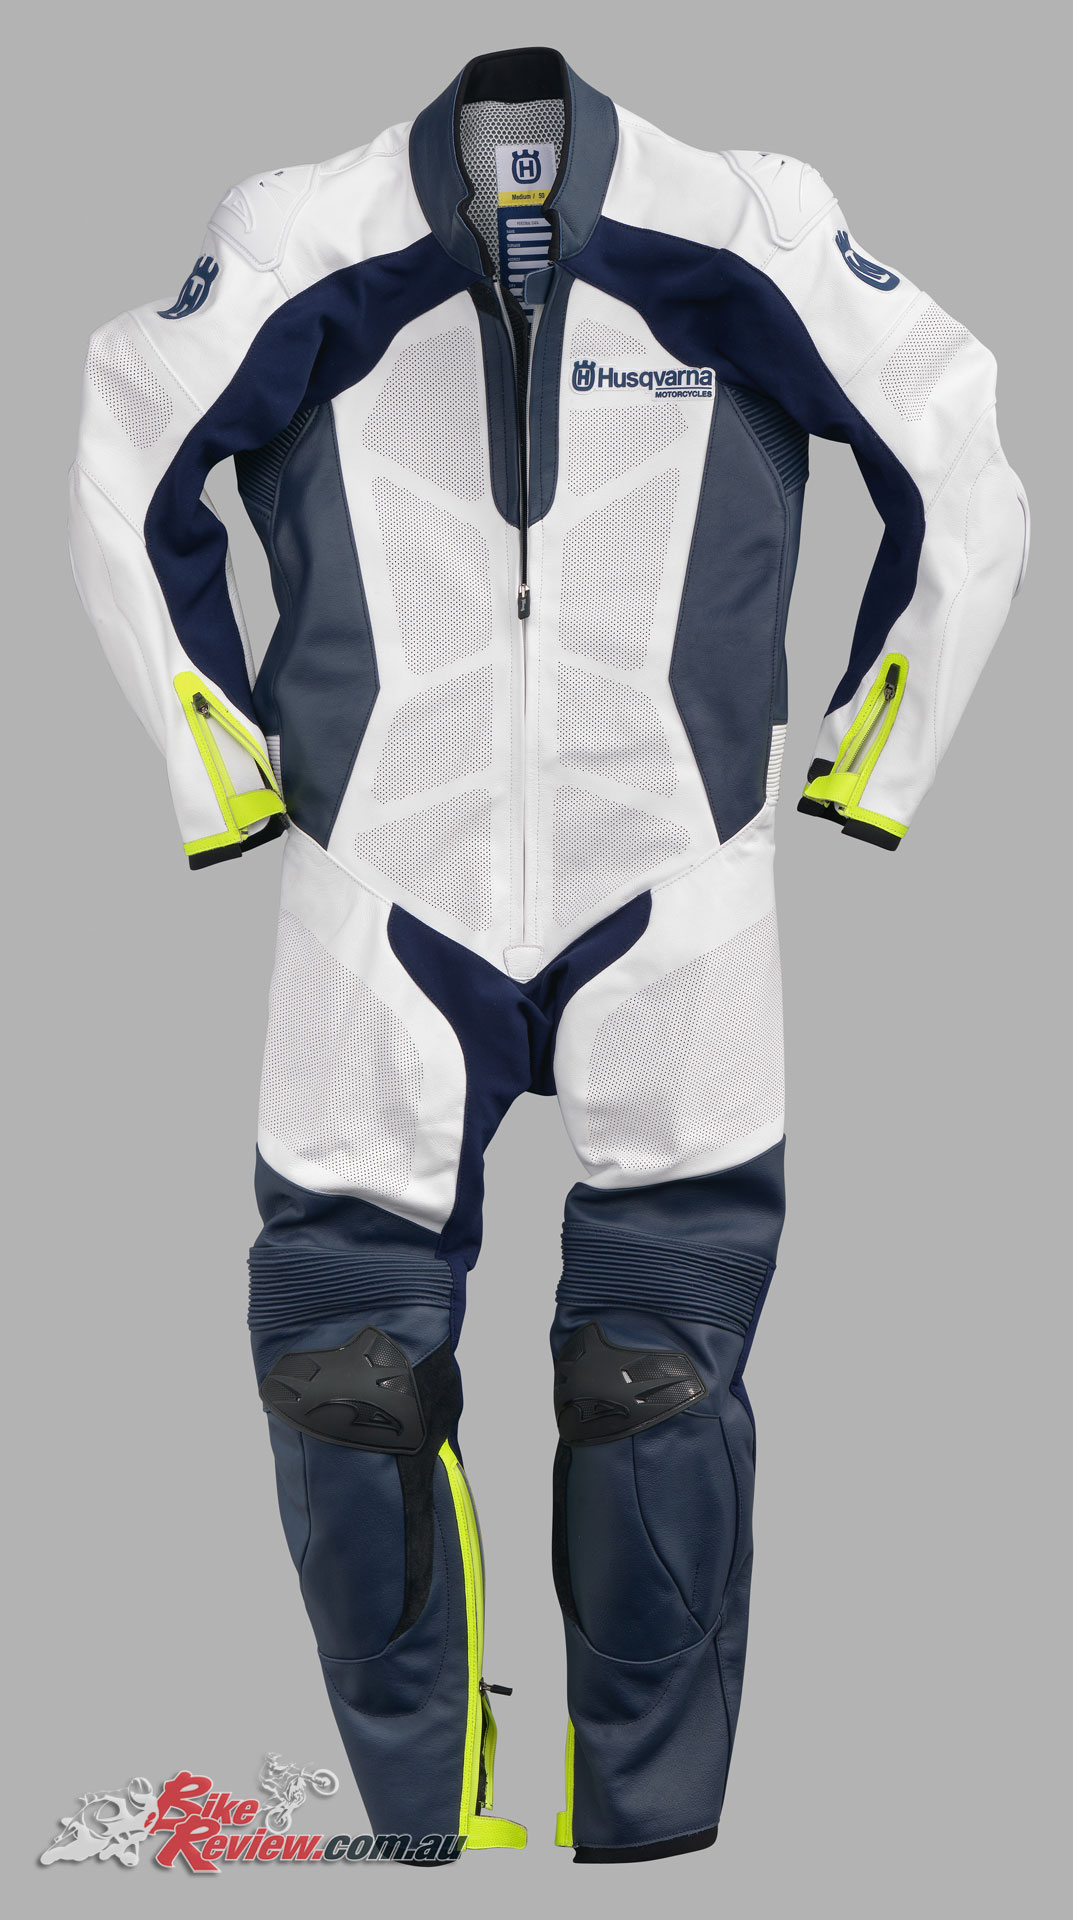 Husqvarna 2018 Horizon Suit